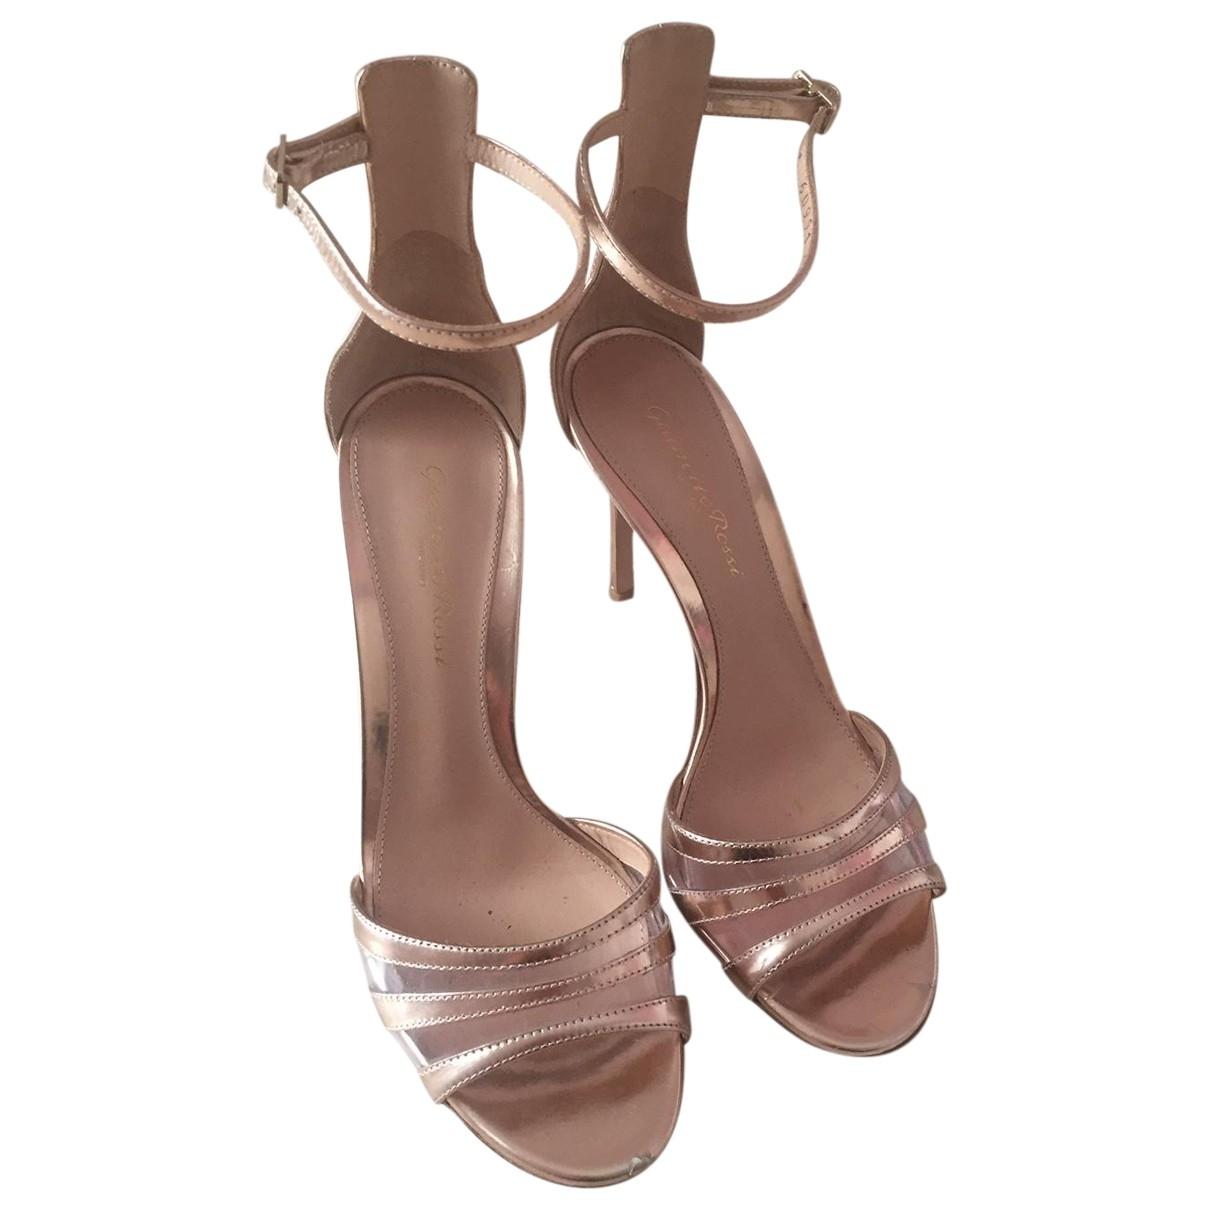 Gianvito Rossi \N Metallic Leather Sandals for Women 36.5 EU